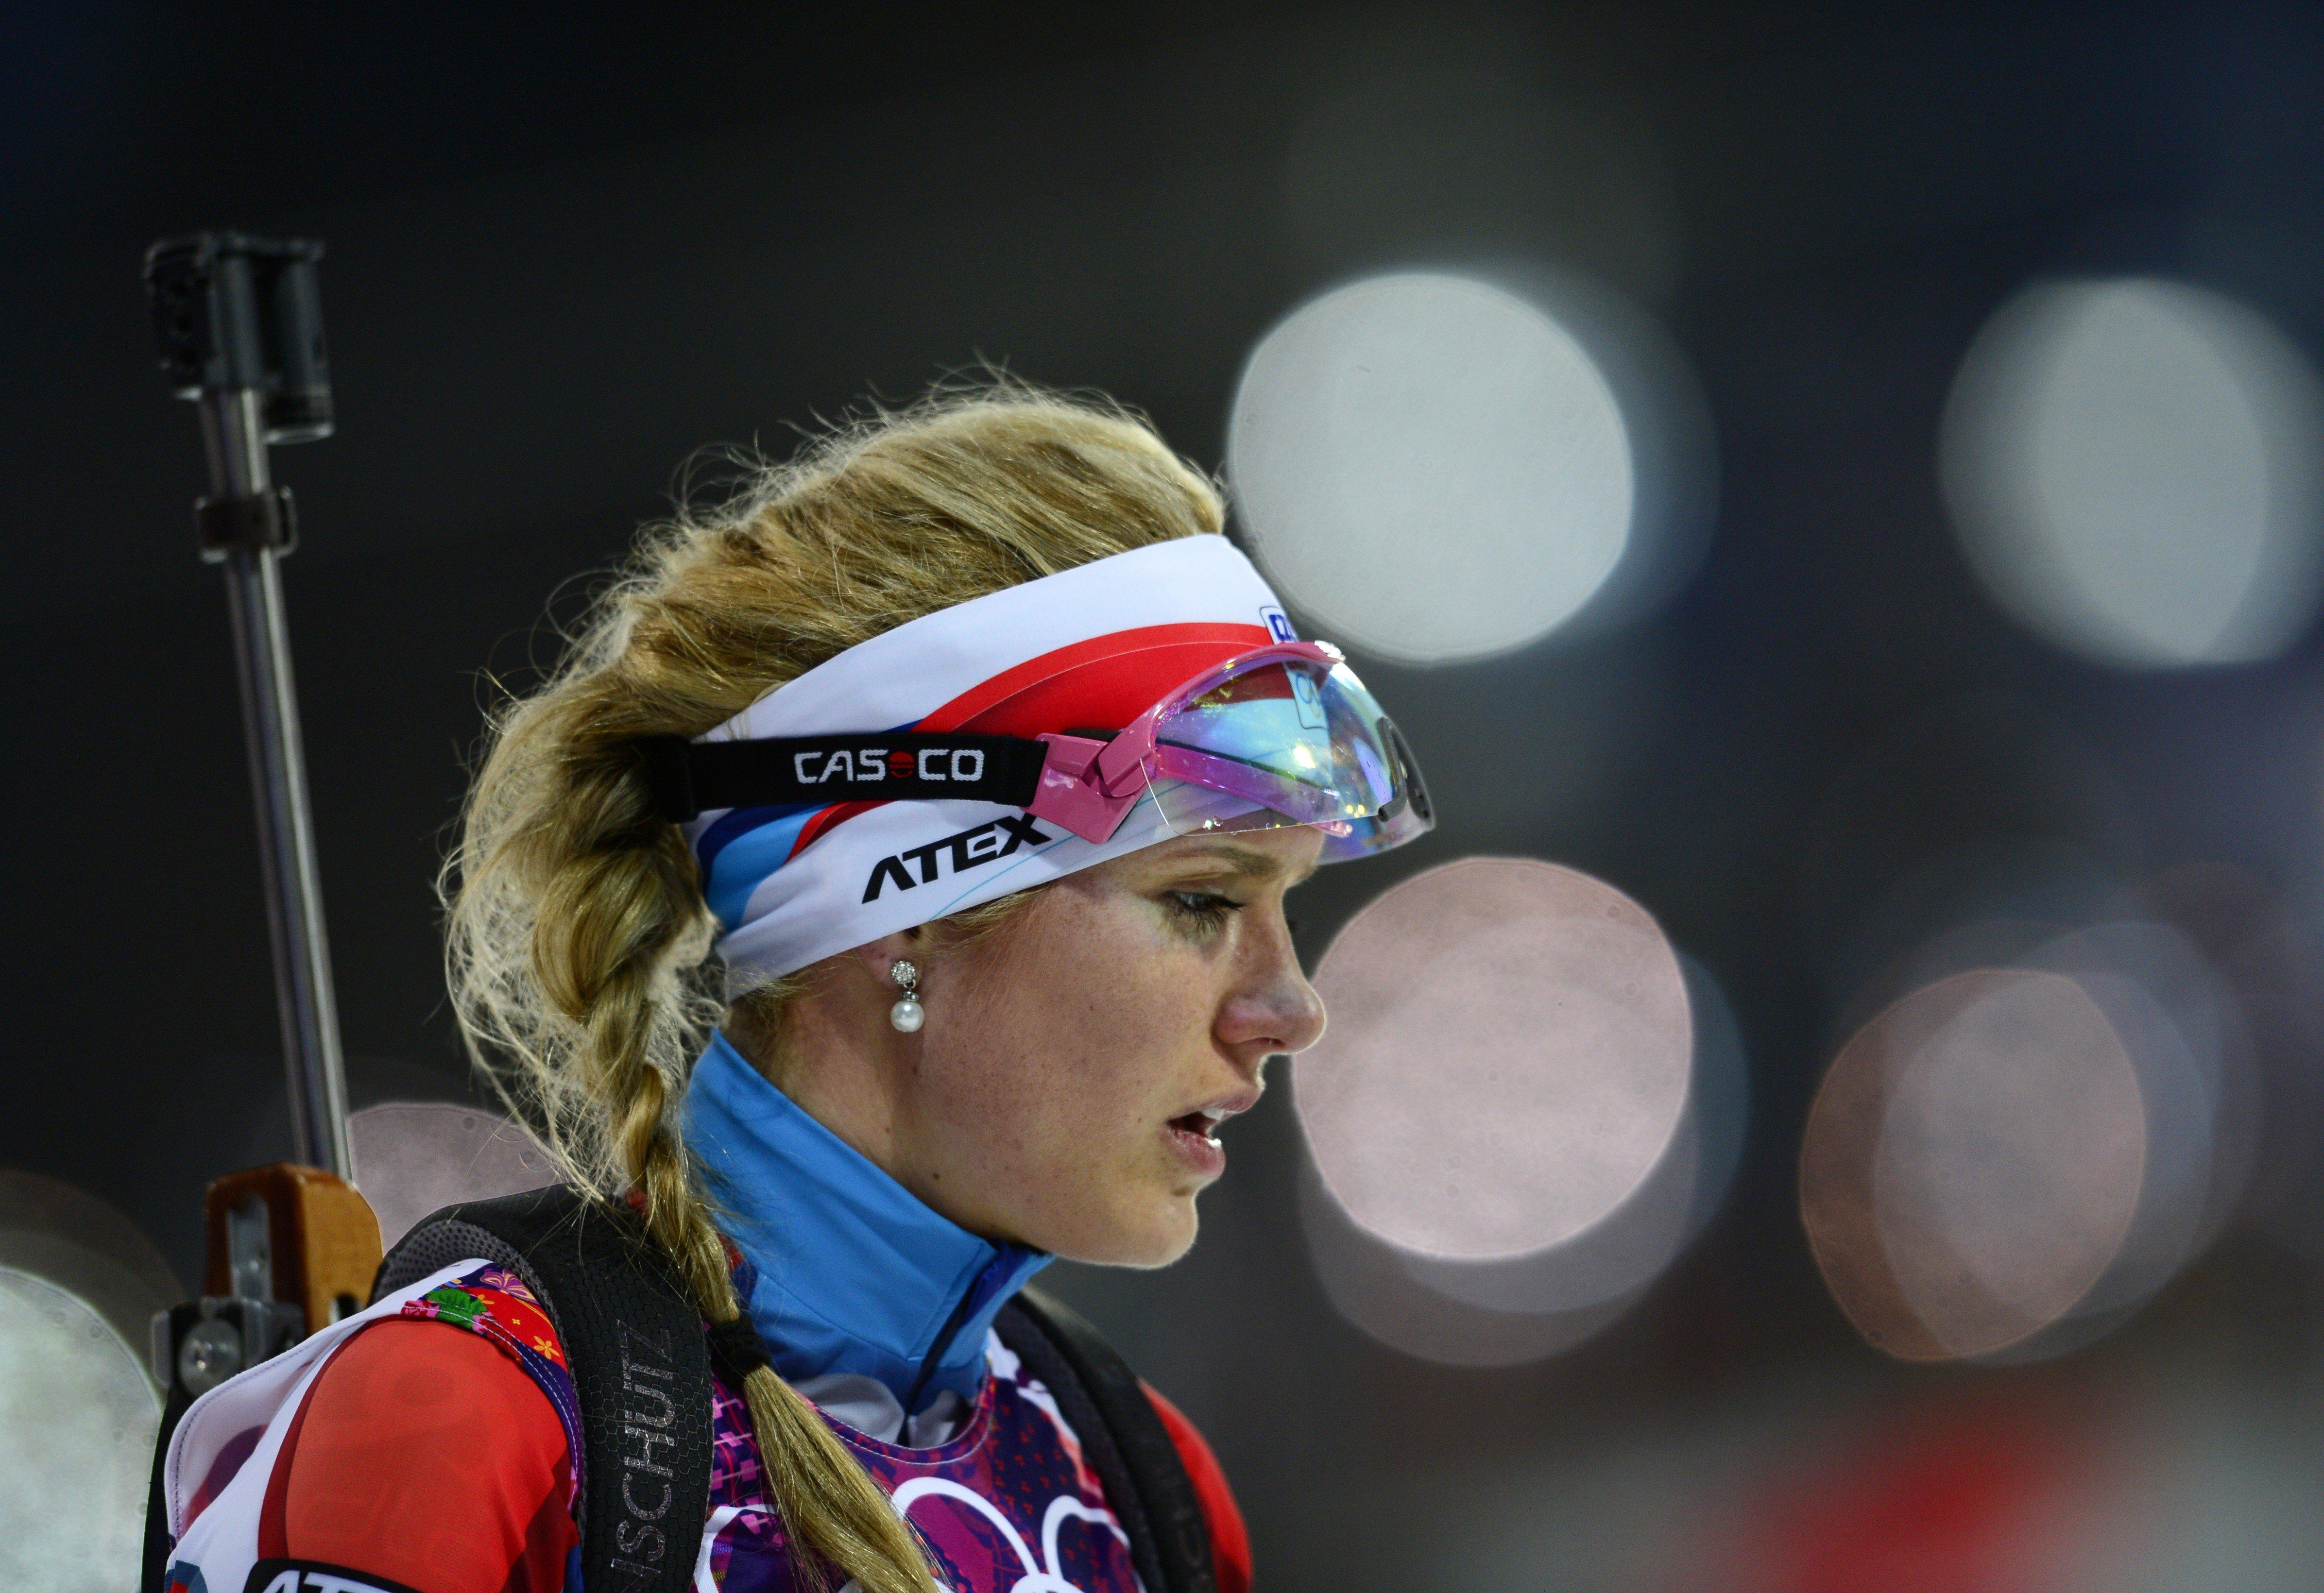 Czech Republic's Gabriela Soukalova is seen after the women's biathlon 15k individual race.